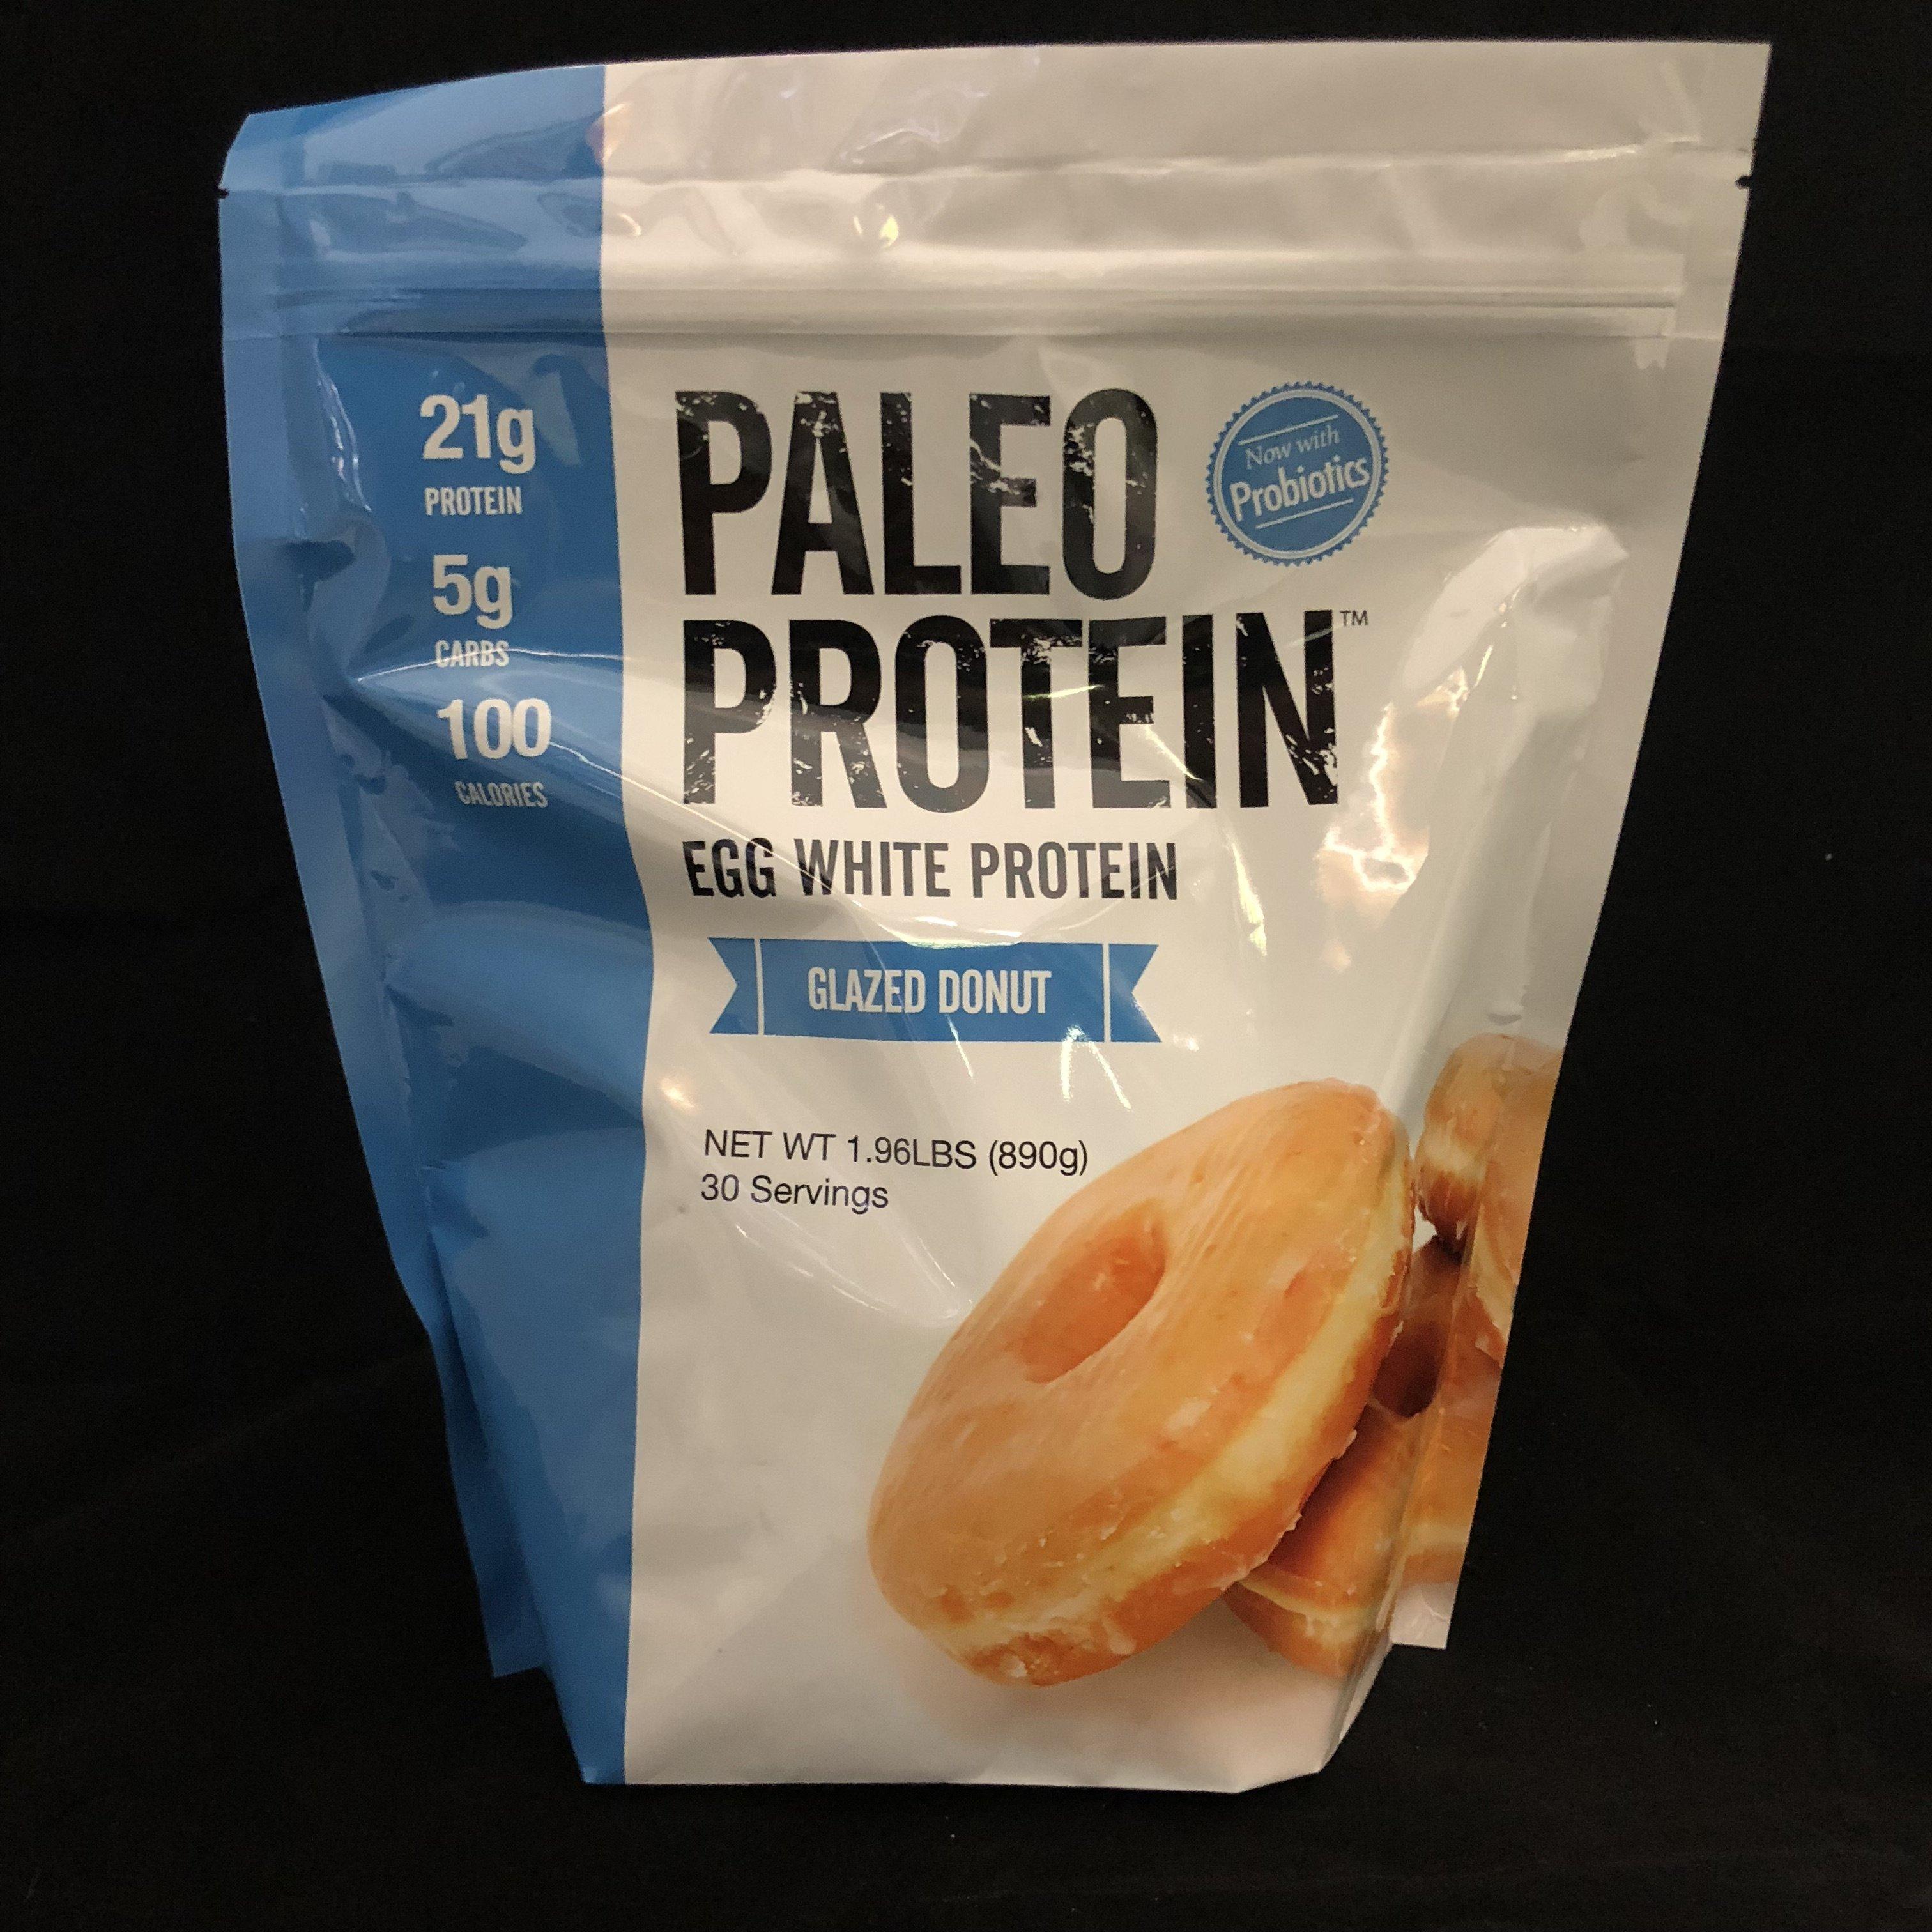 Paleo Protein Glazed Donut 813926004140